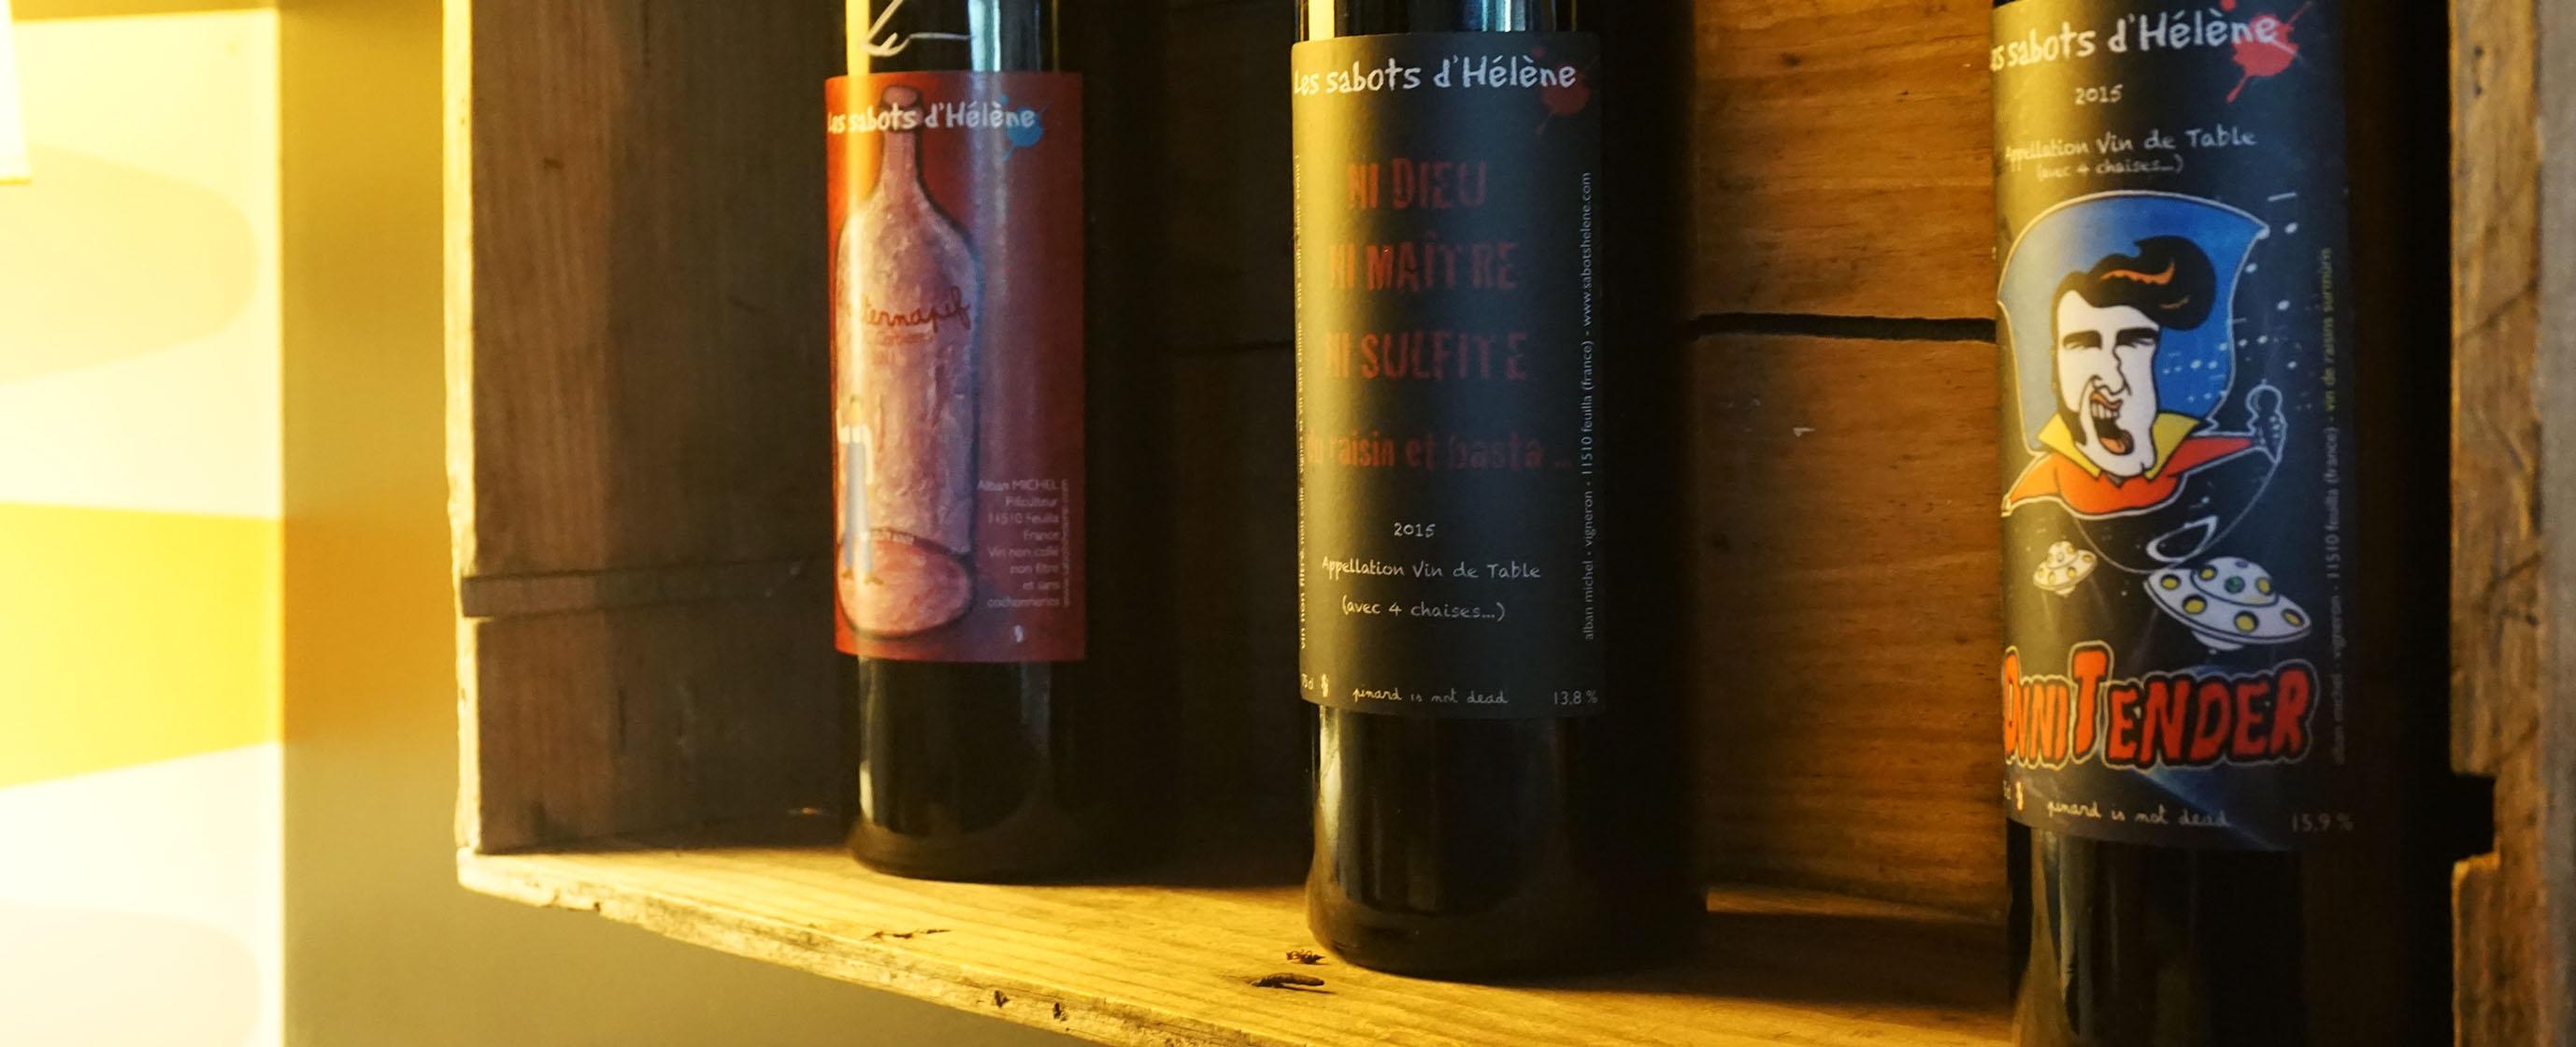 vin nature, alternatif